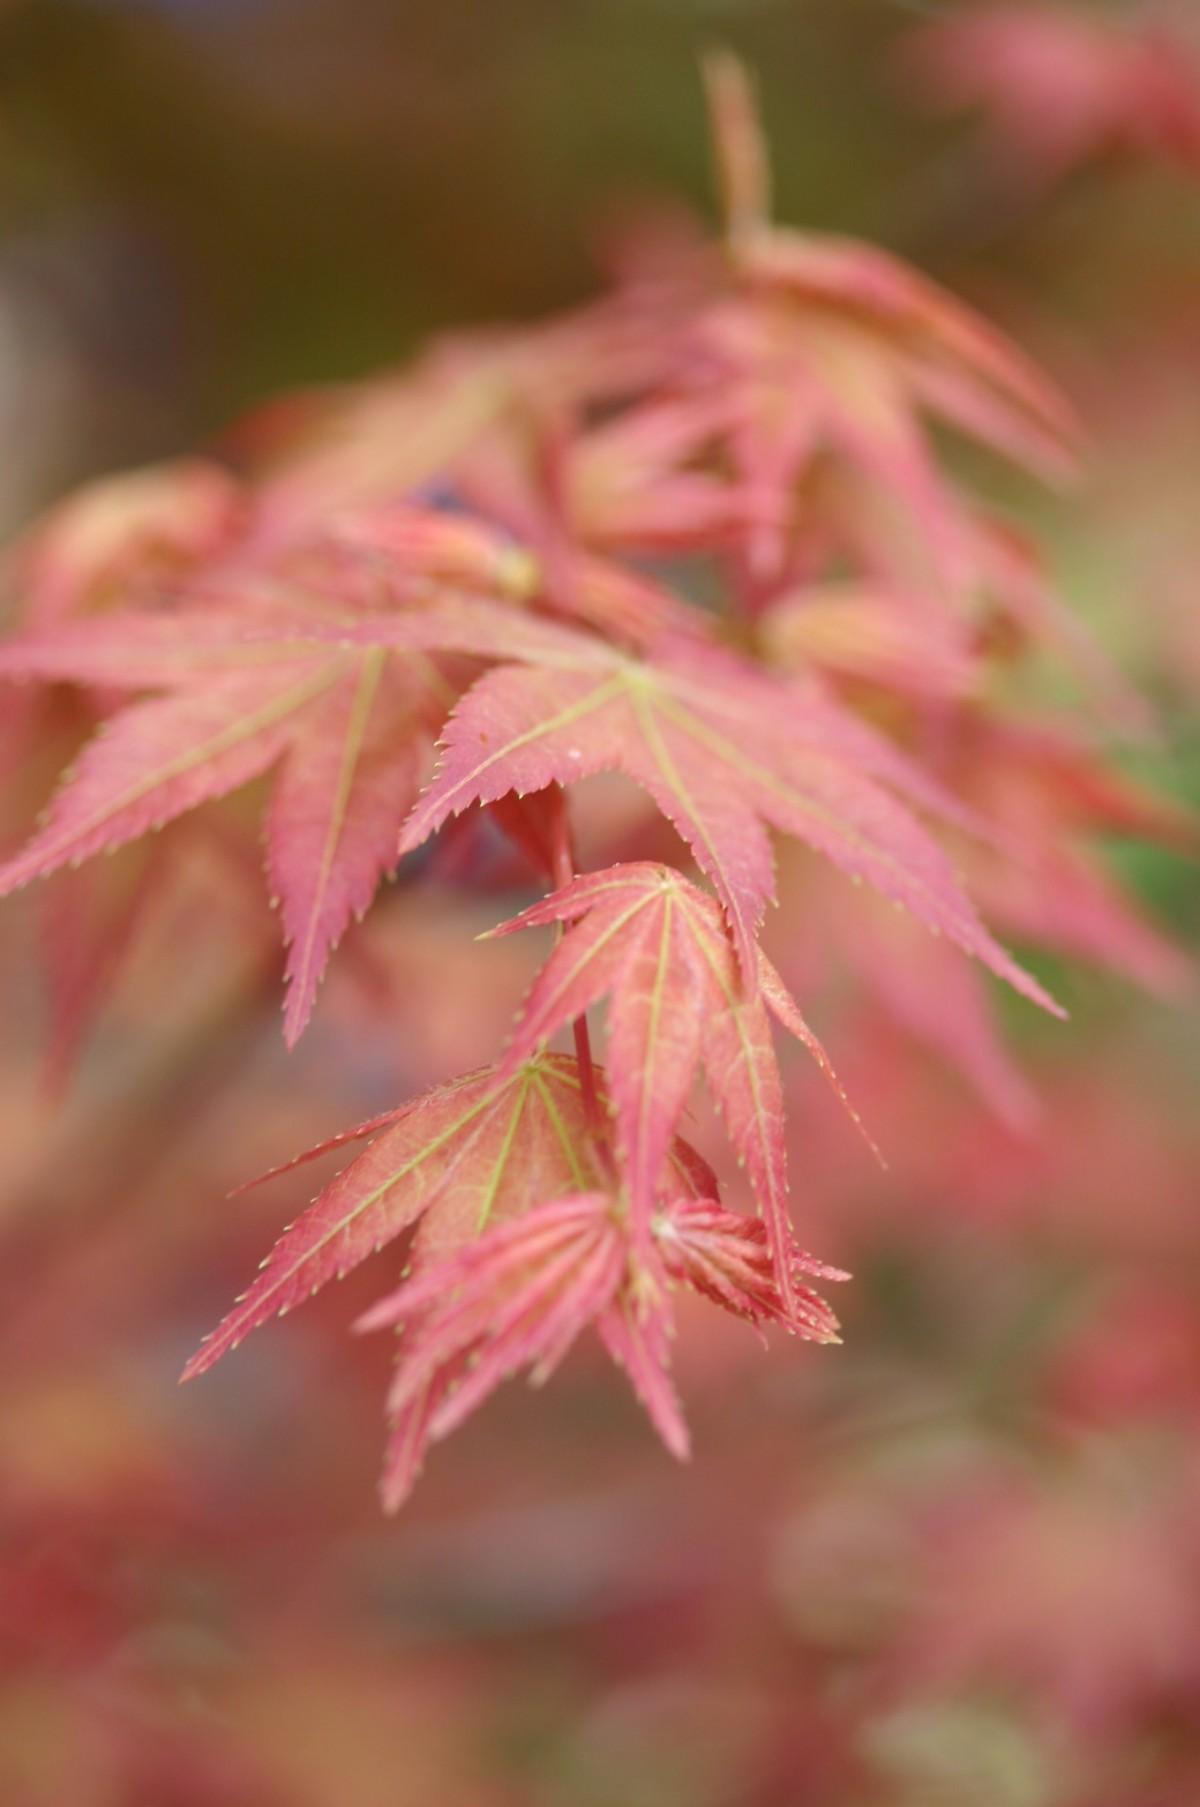 kostenlose foto baum ast bl hen sonnenlicht blatt blume bl tenblatt herbst rosa flora. Black Bedroom Furniture Sets. Home Design Ideas